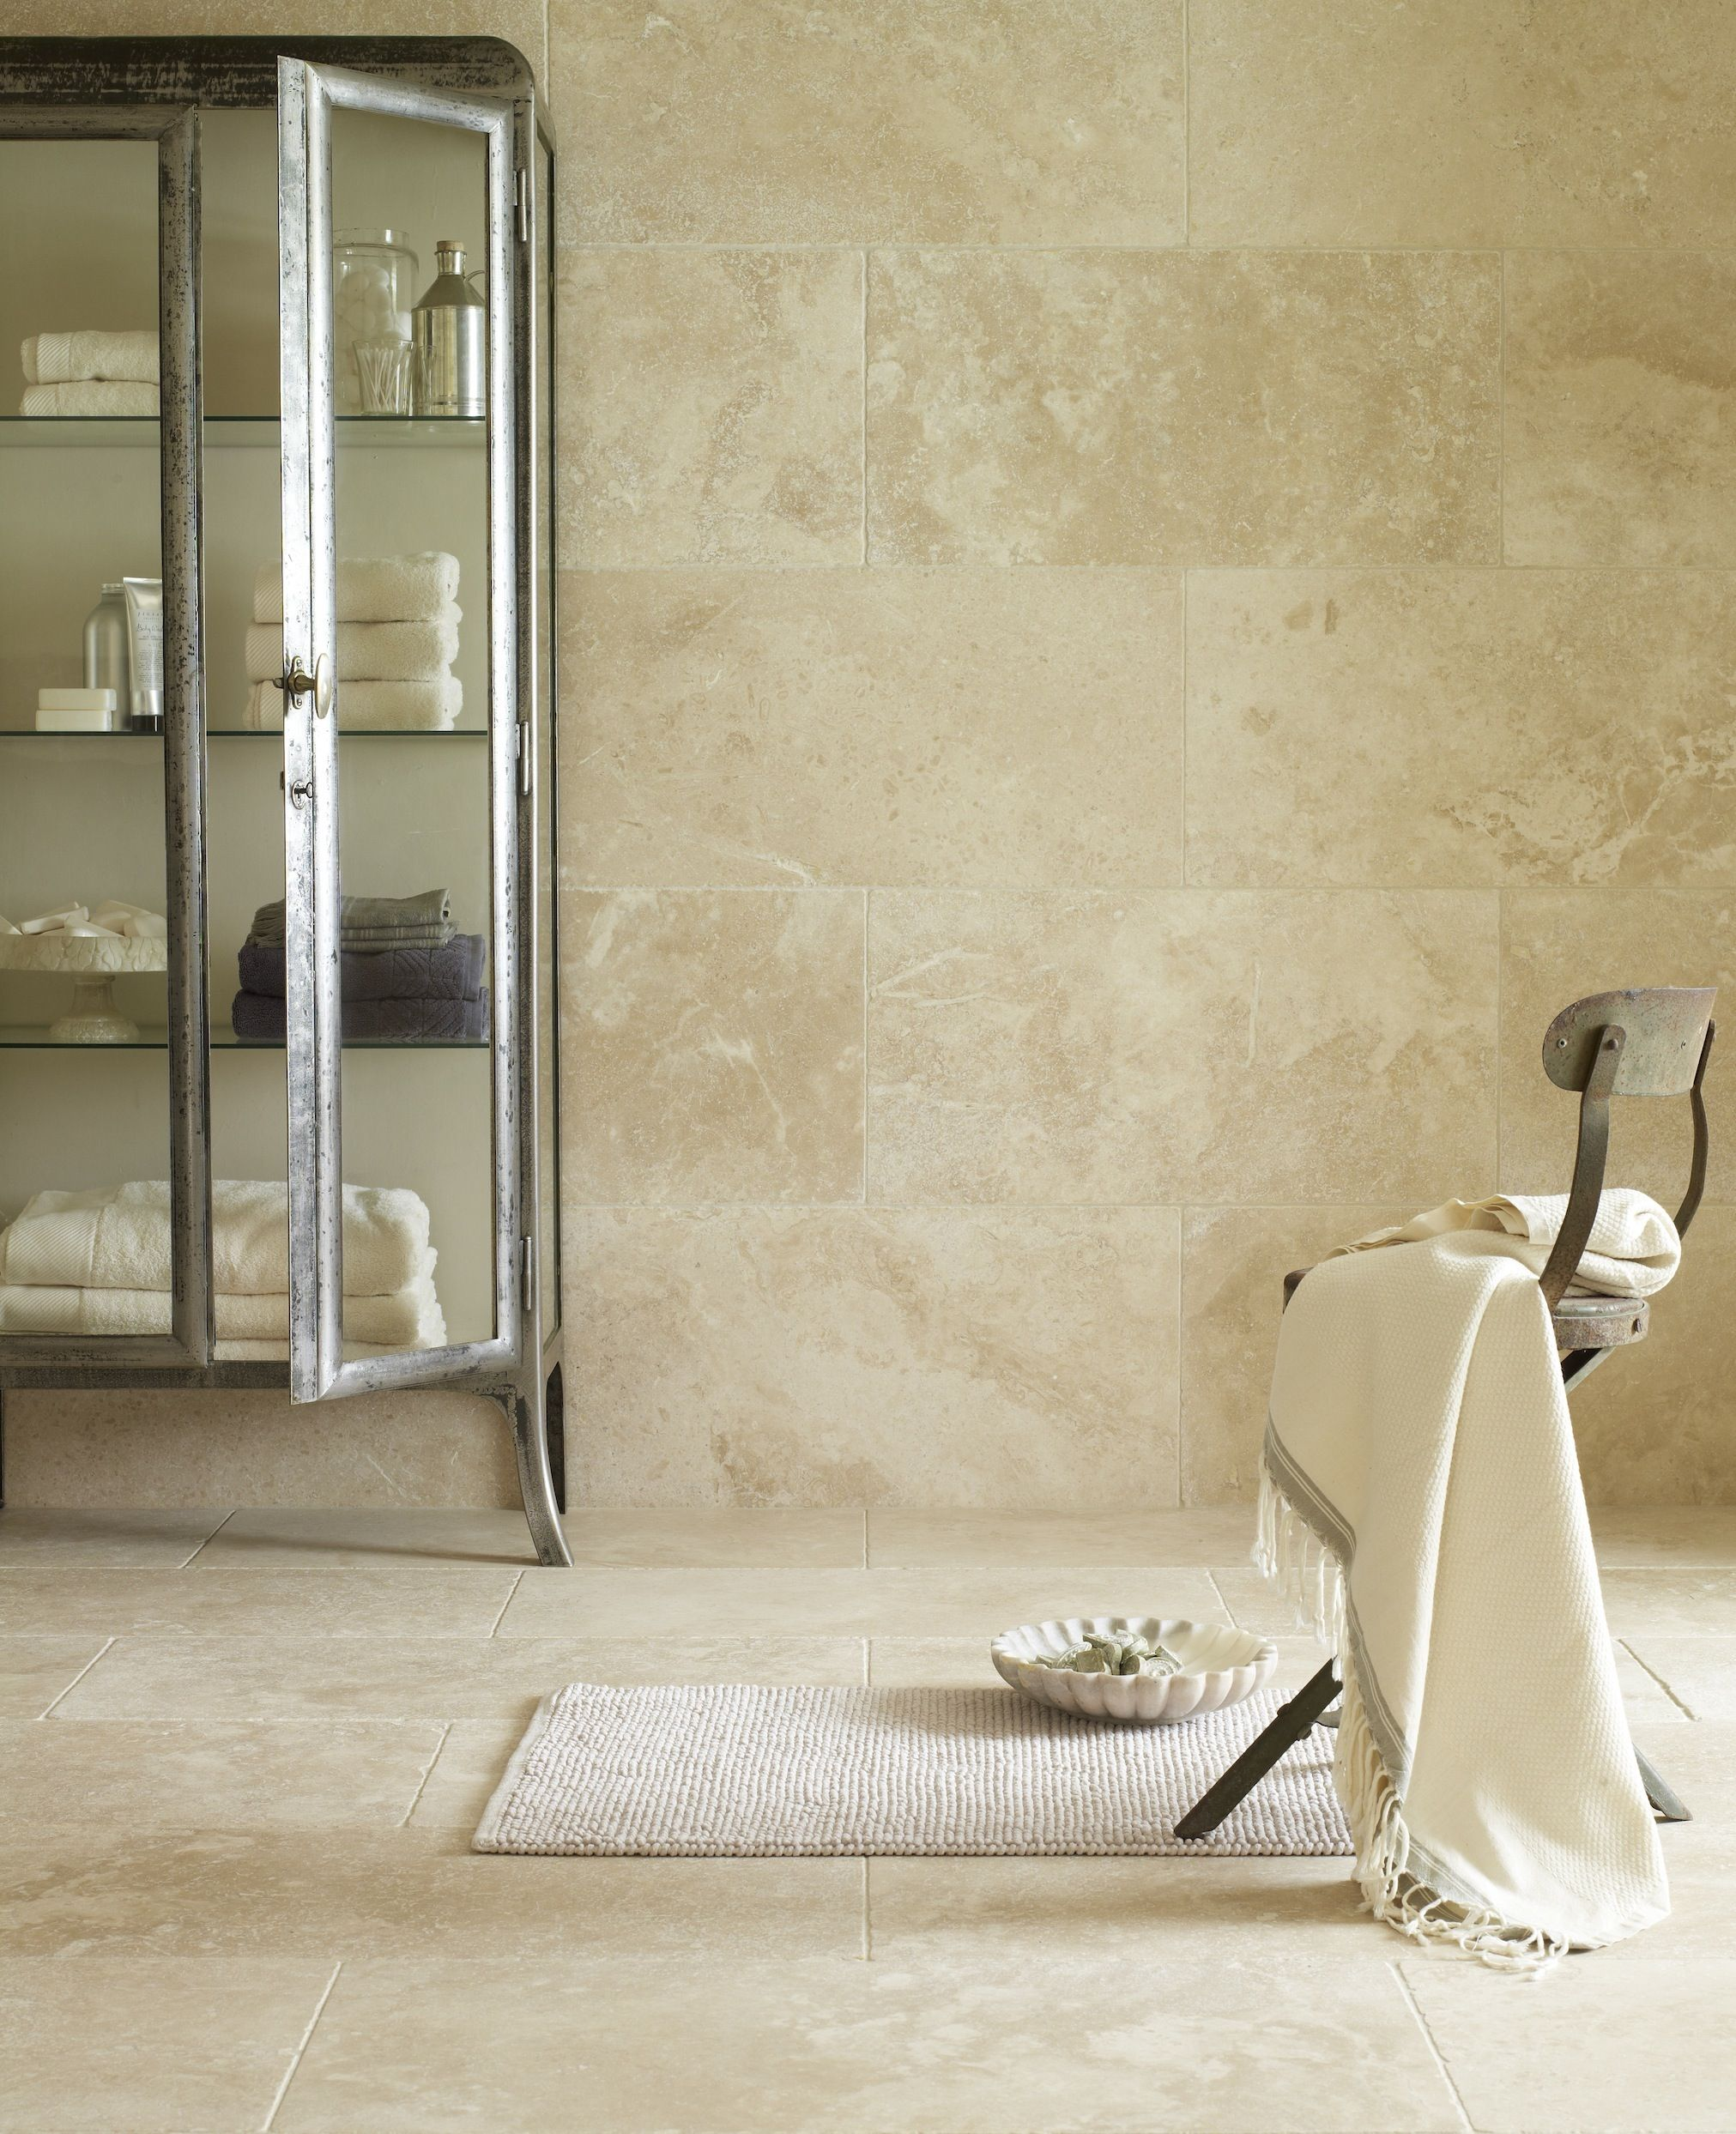 Corinth Tumbled Travertine Tile   Stone tiles, Travertine and ...